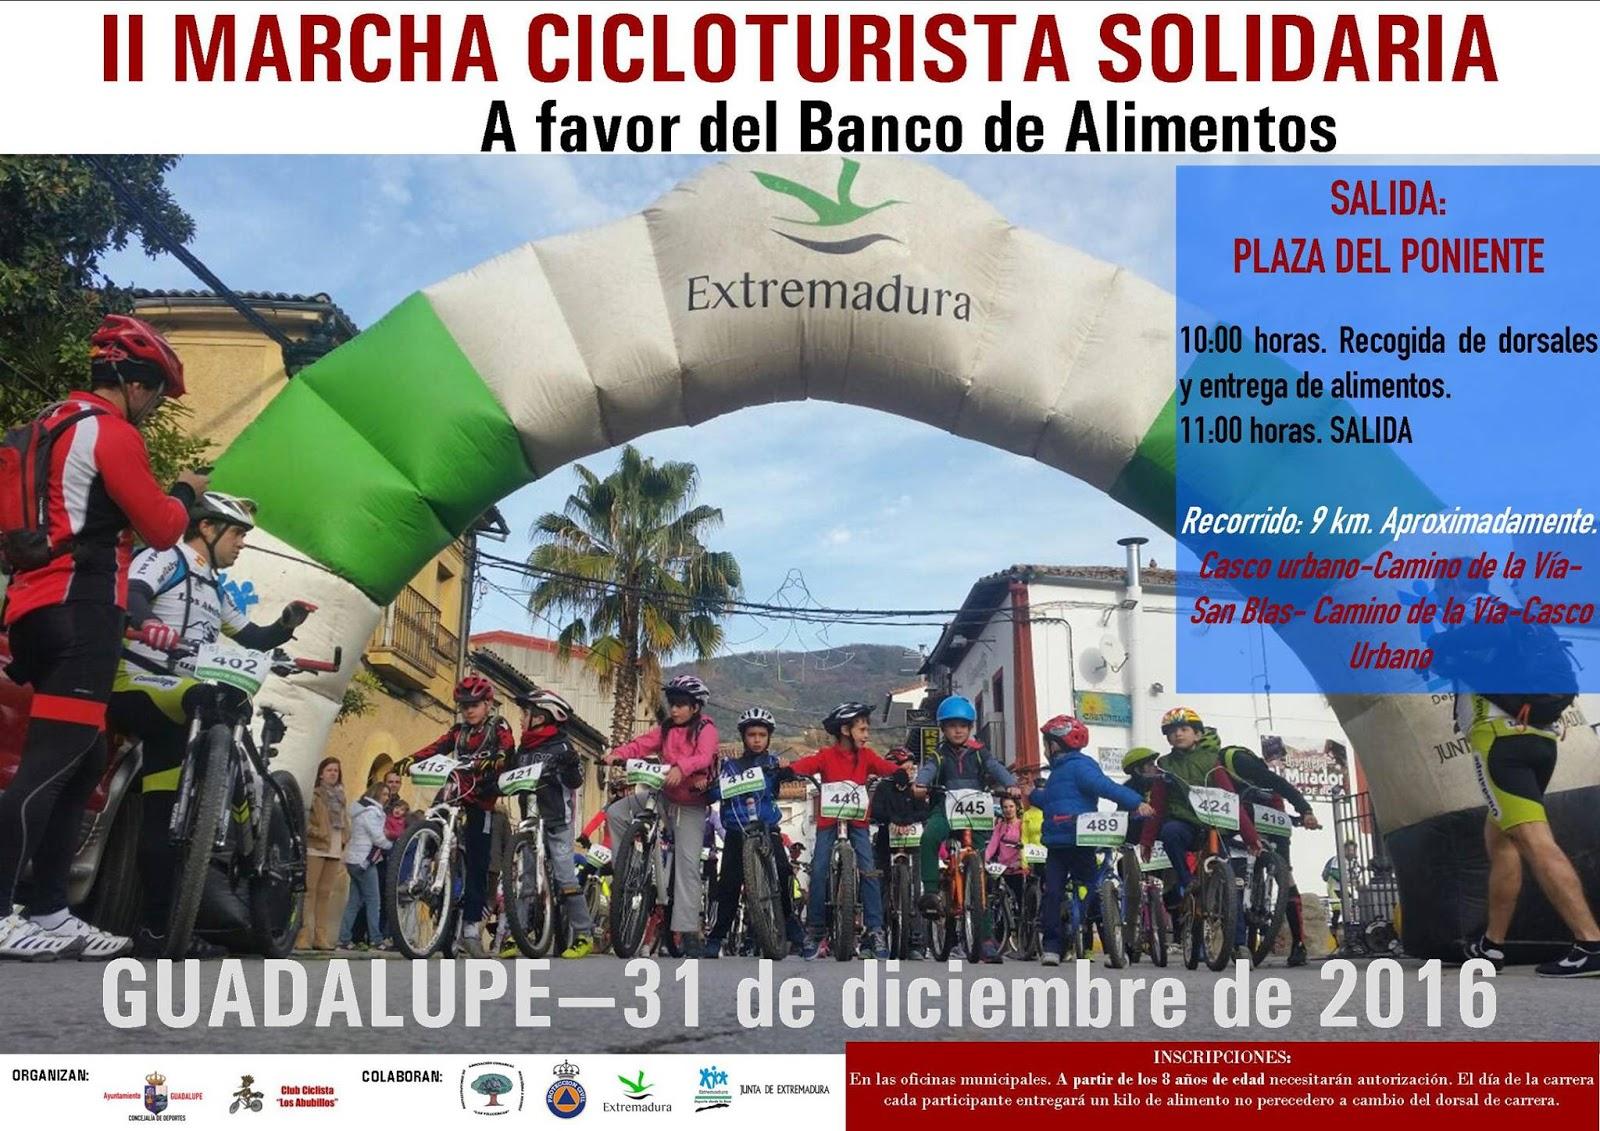 II Marcha Cicloturista Solidaria - Guadalupe